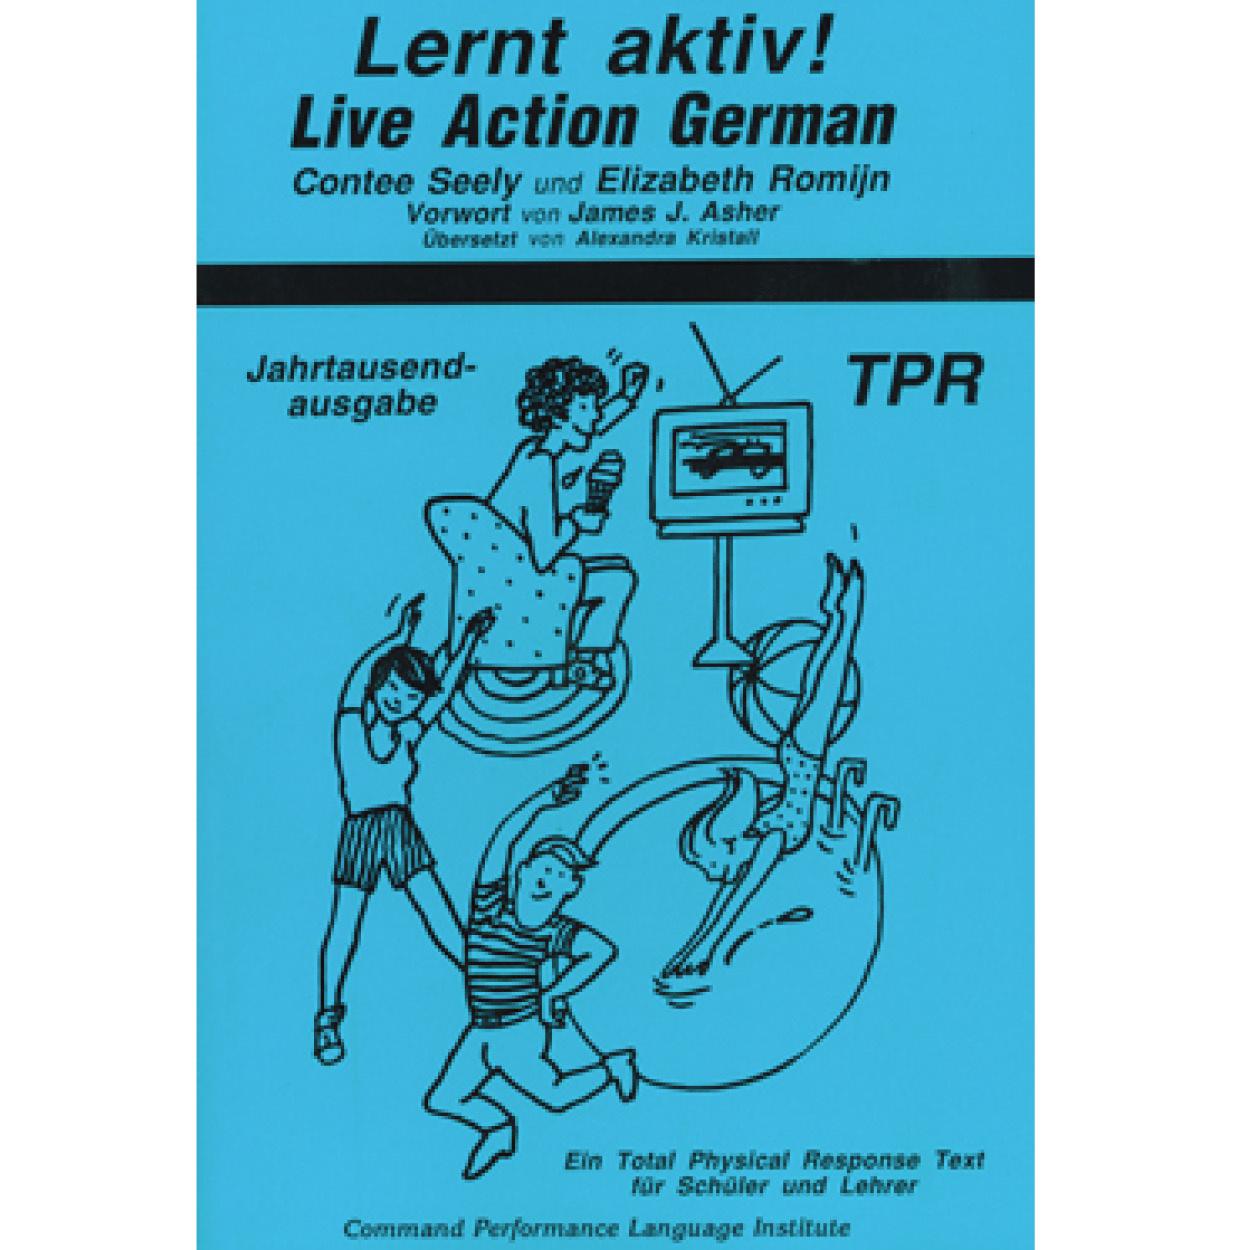 Lernt aktiv! Live action German!